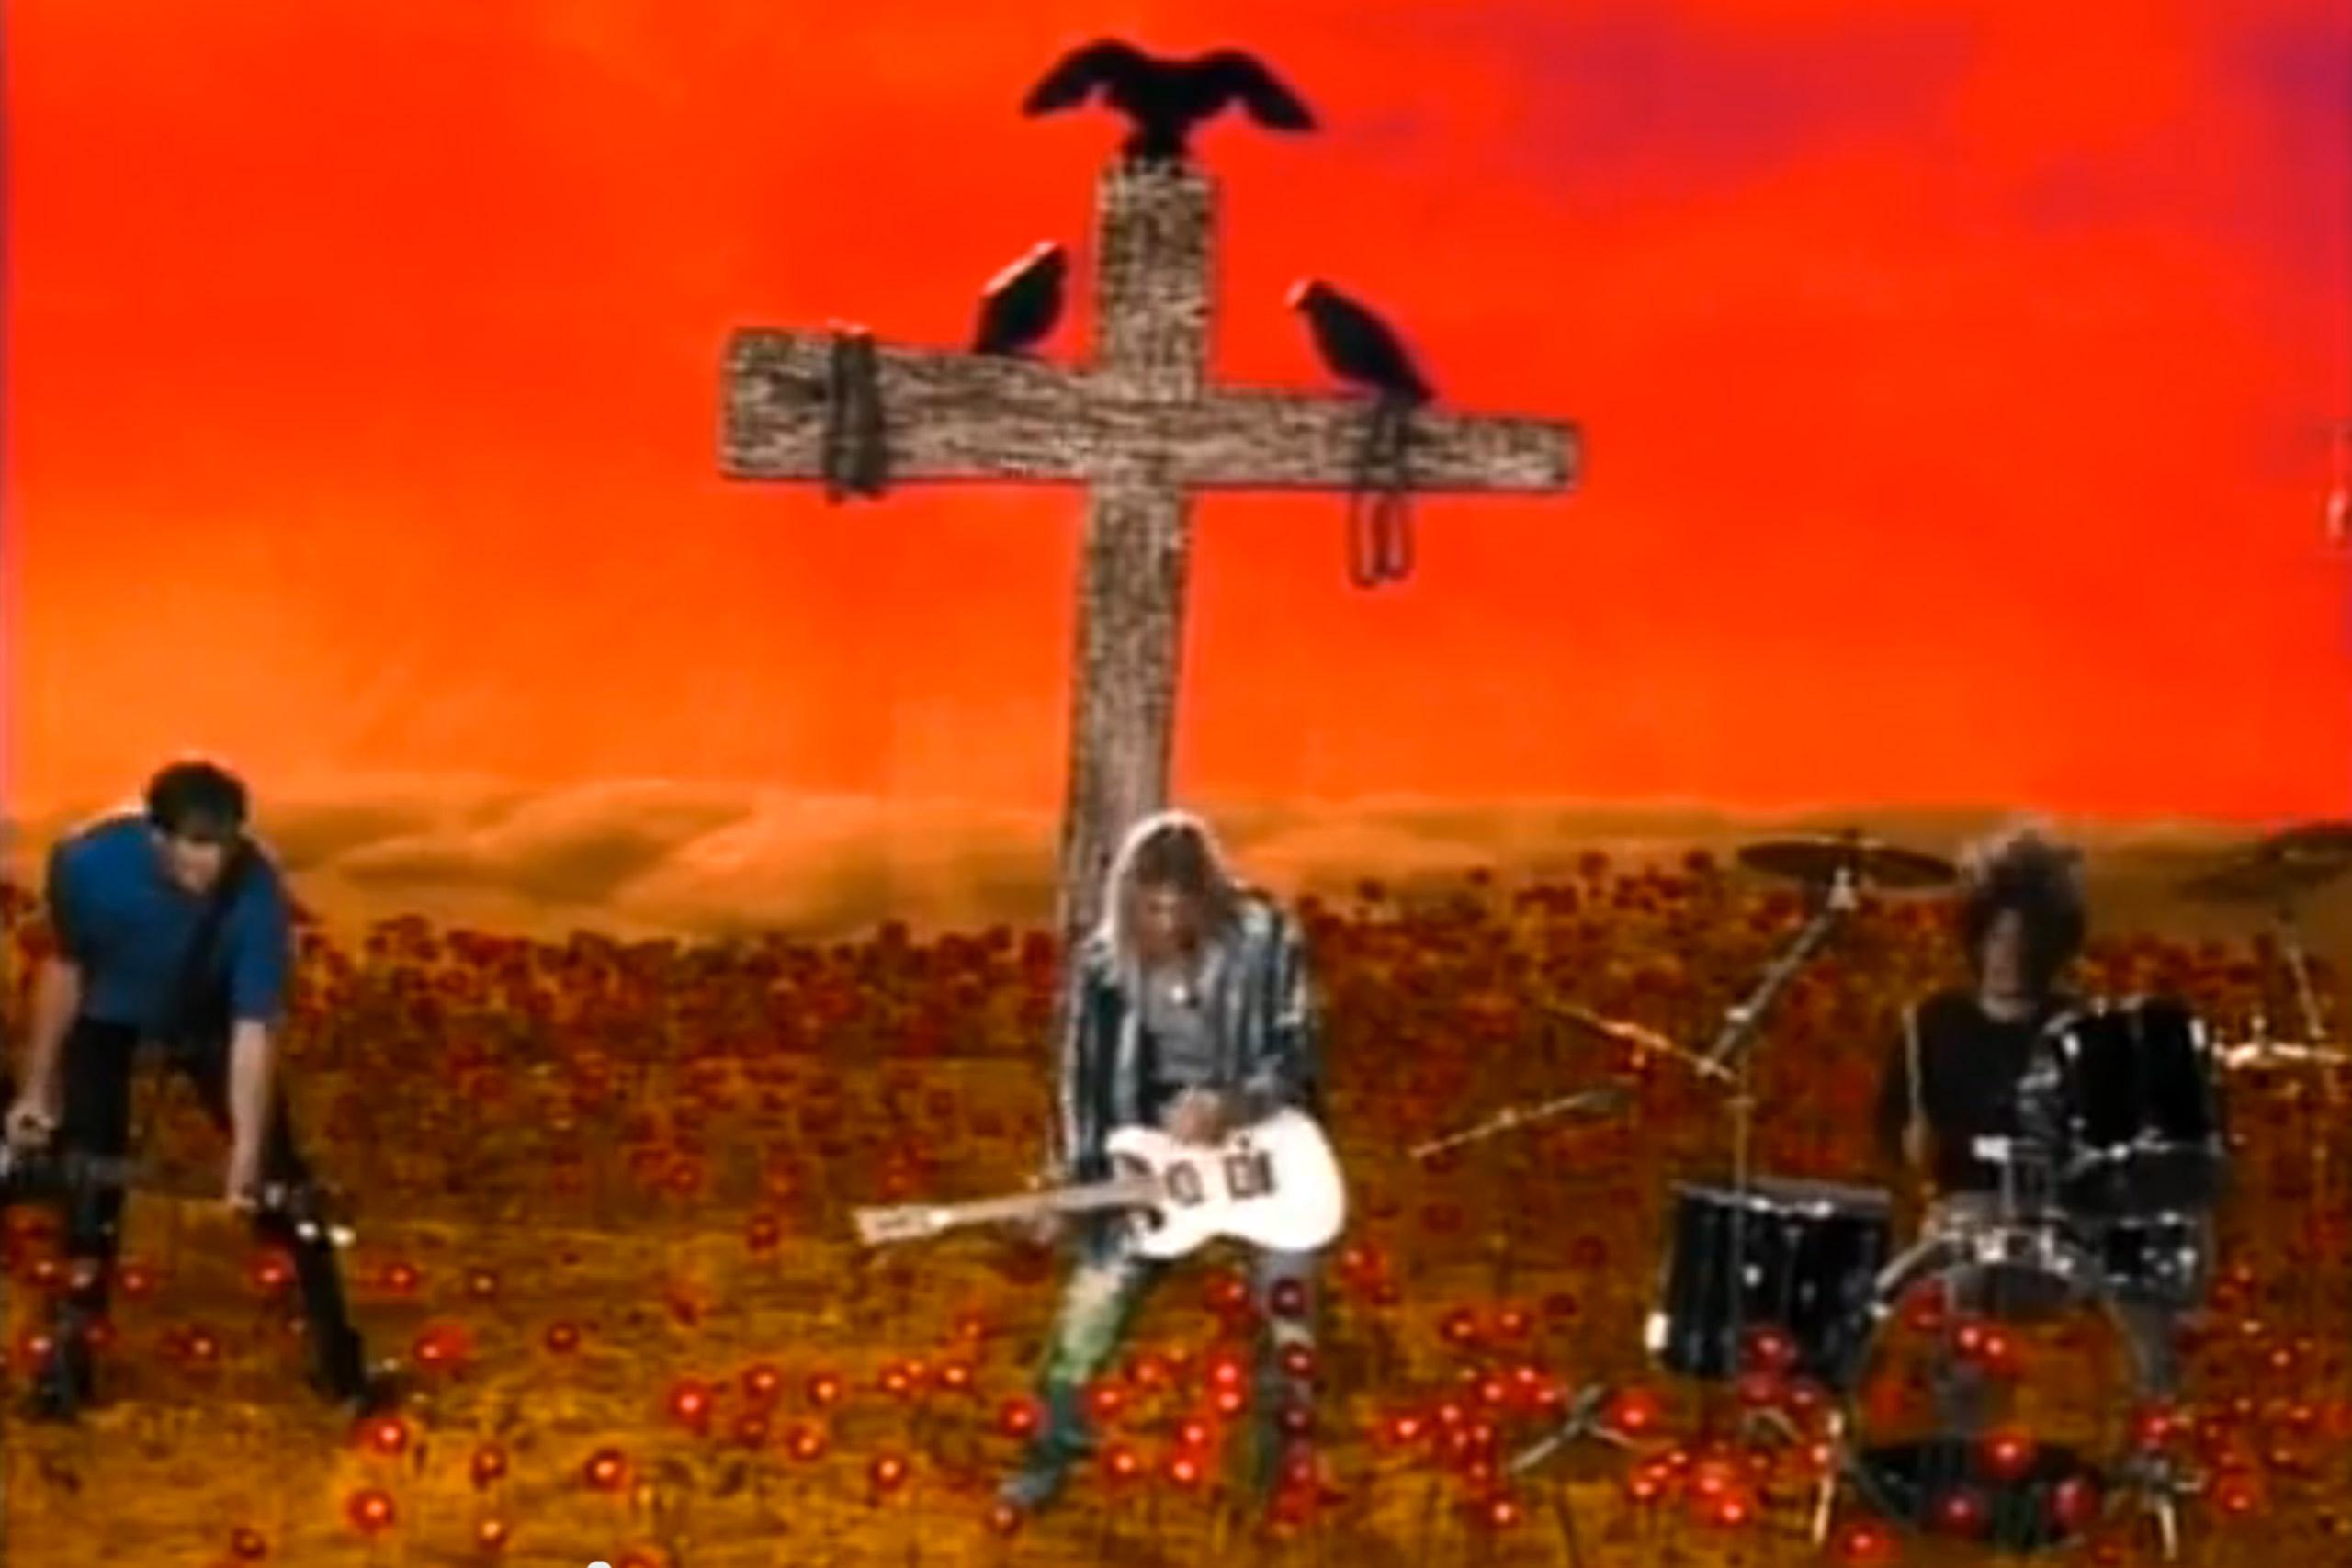 How Nirvana Shot the 'Heart-Shaped Box' Video